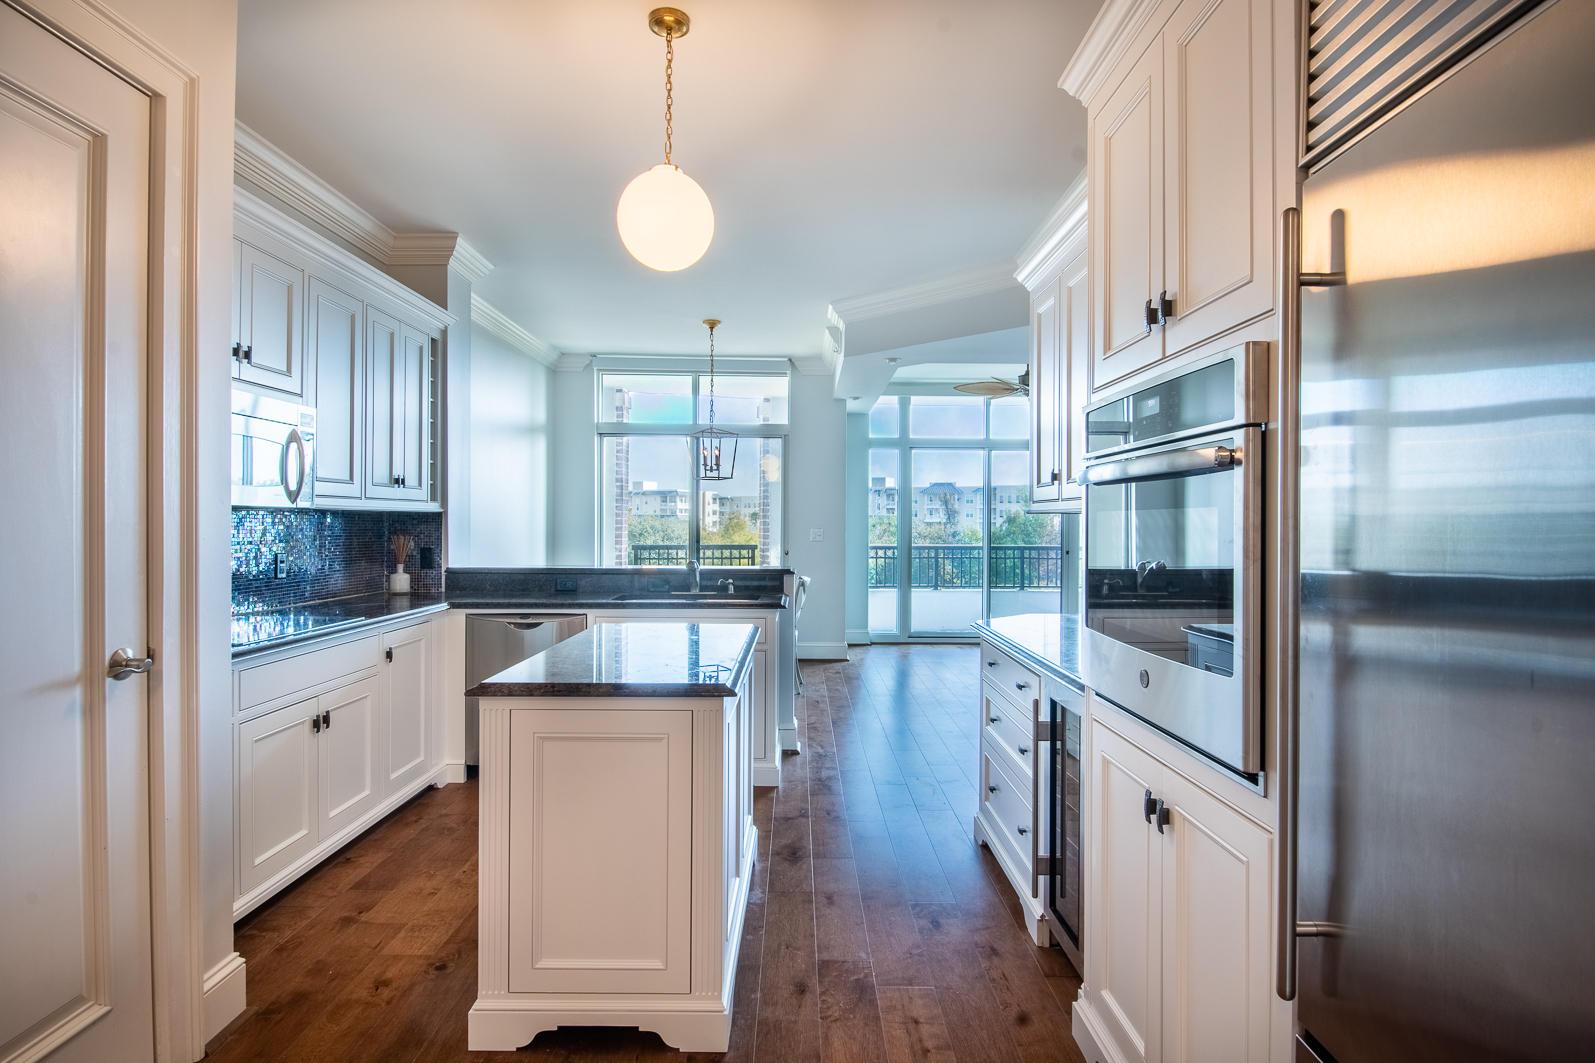 Renaissance On Chas Harbor Homes For Sale - 144 Plaza, Mount Pleasant, SC - 31